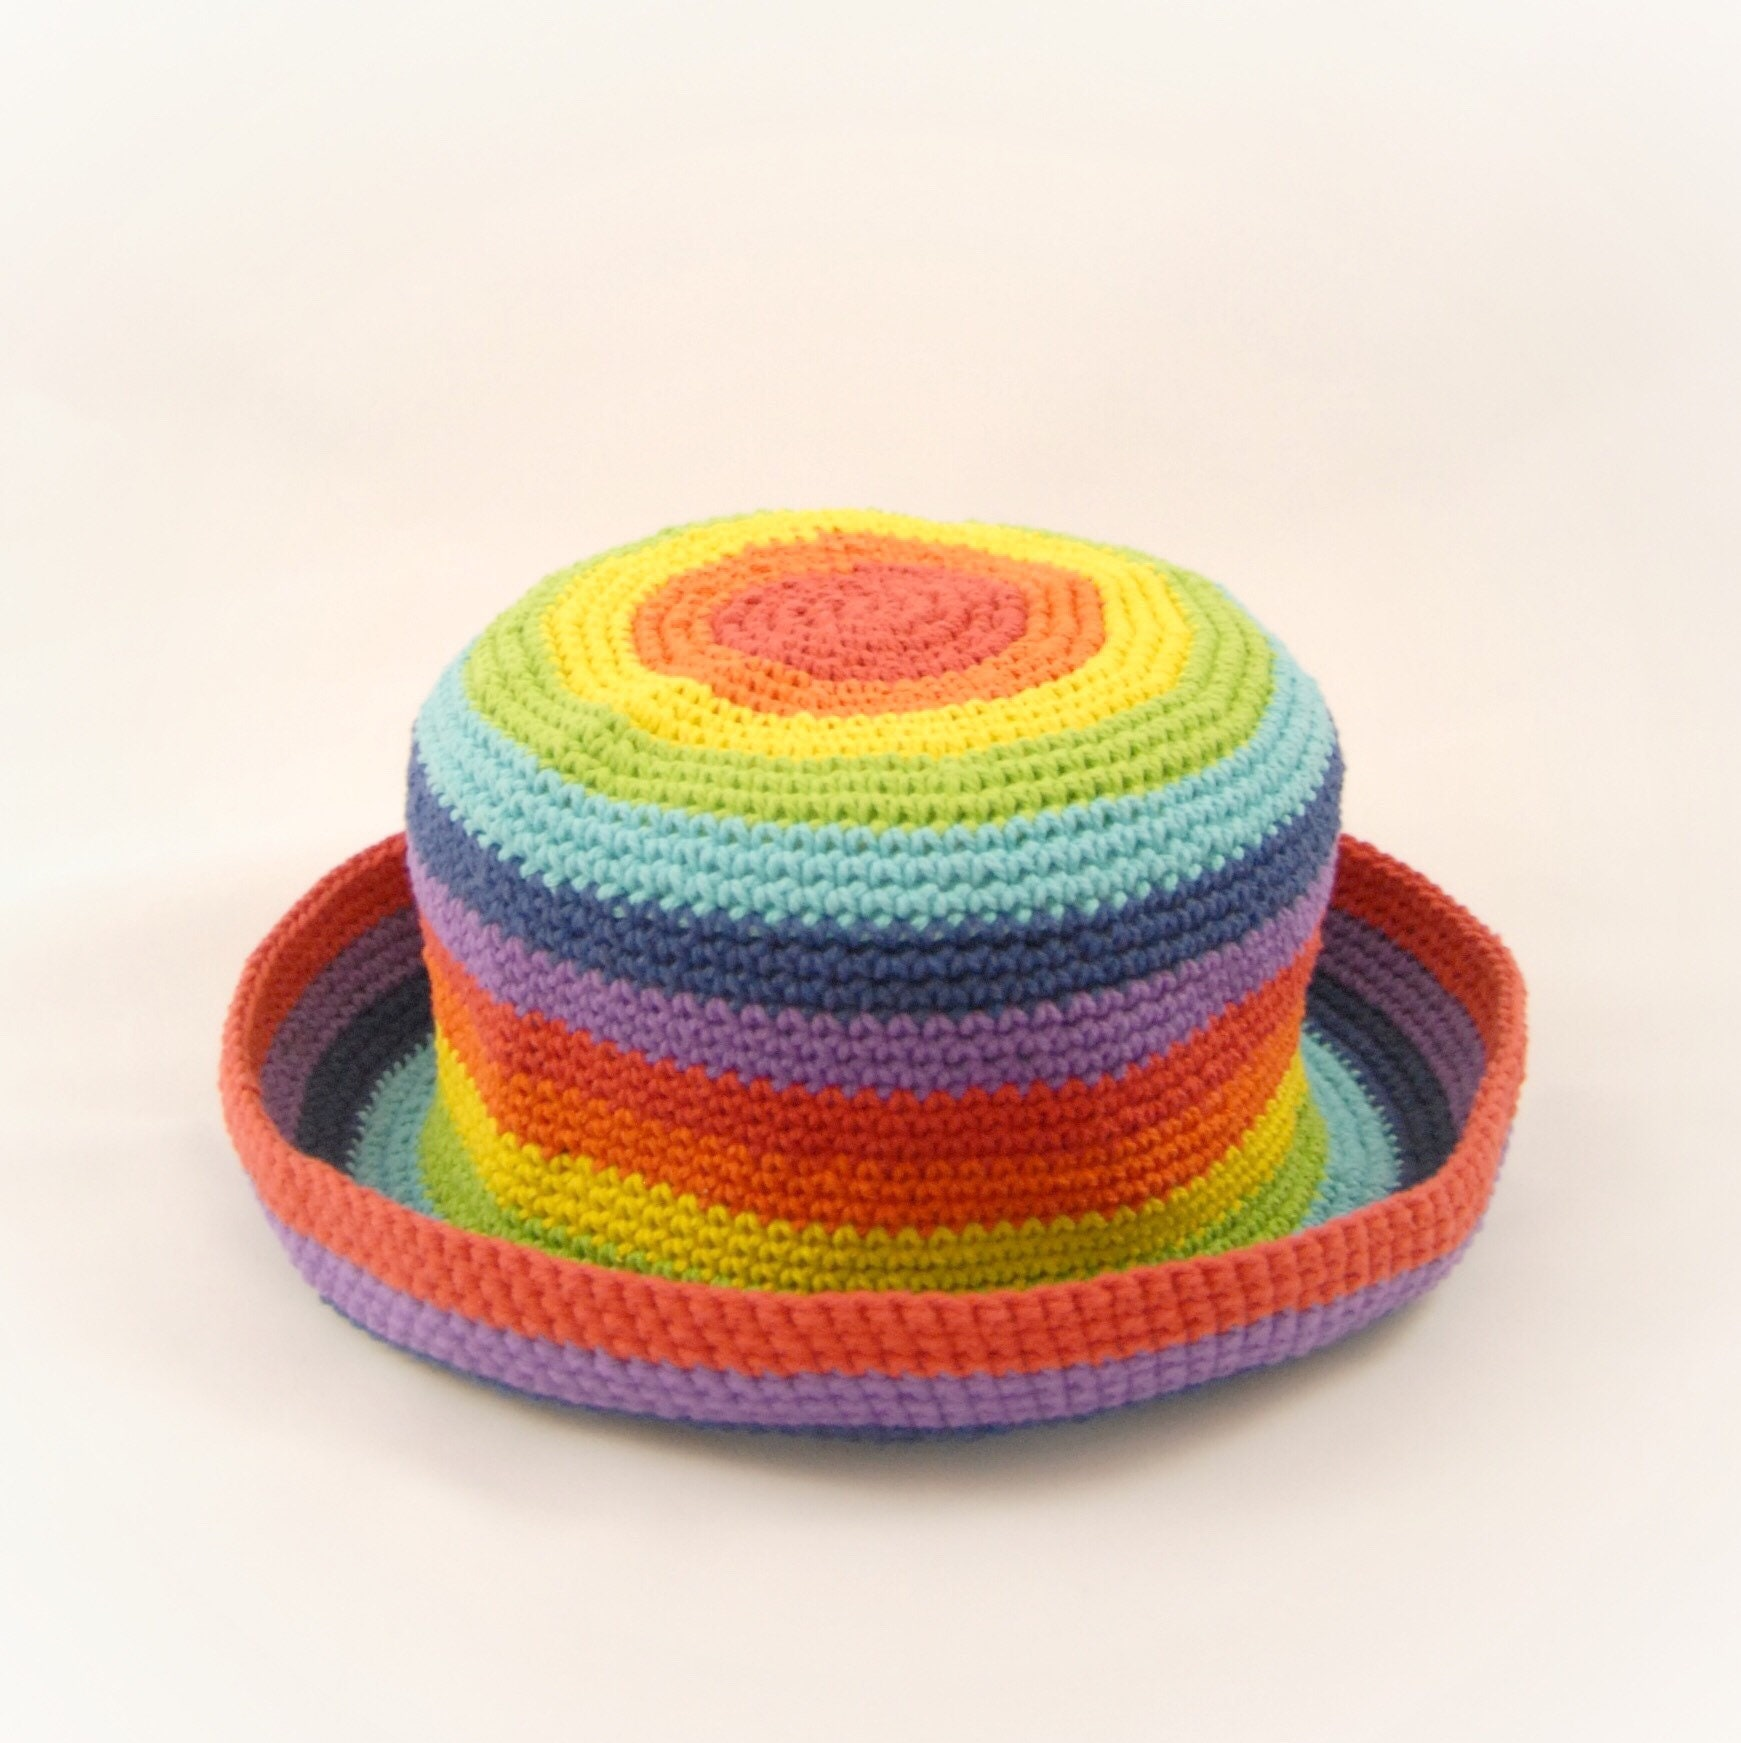 RAINBOW Hat Handmade 100% Cotton Crochet Spring Summer Floppy  3461793f1c5